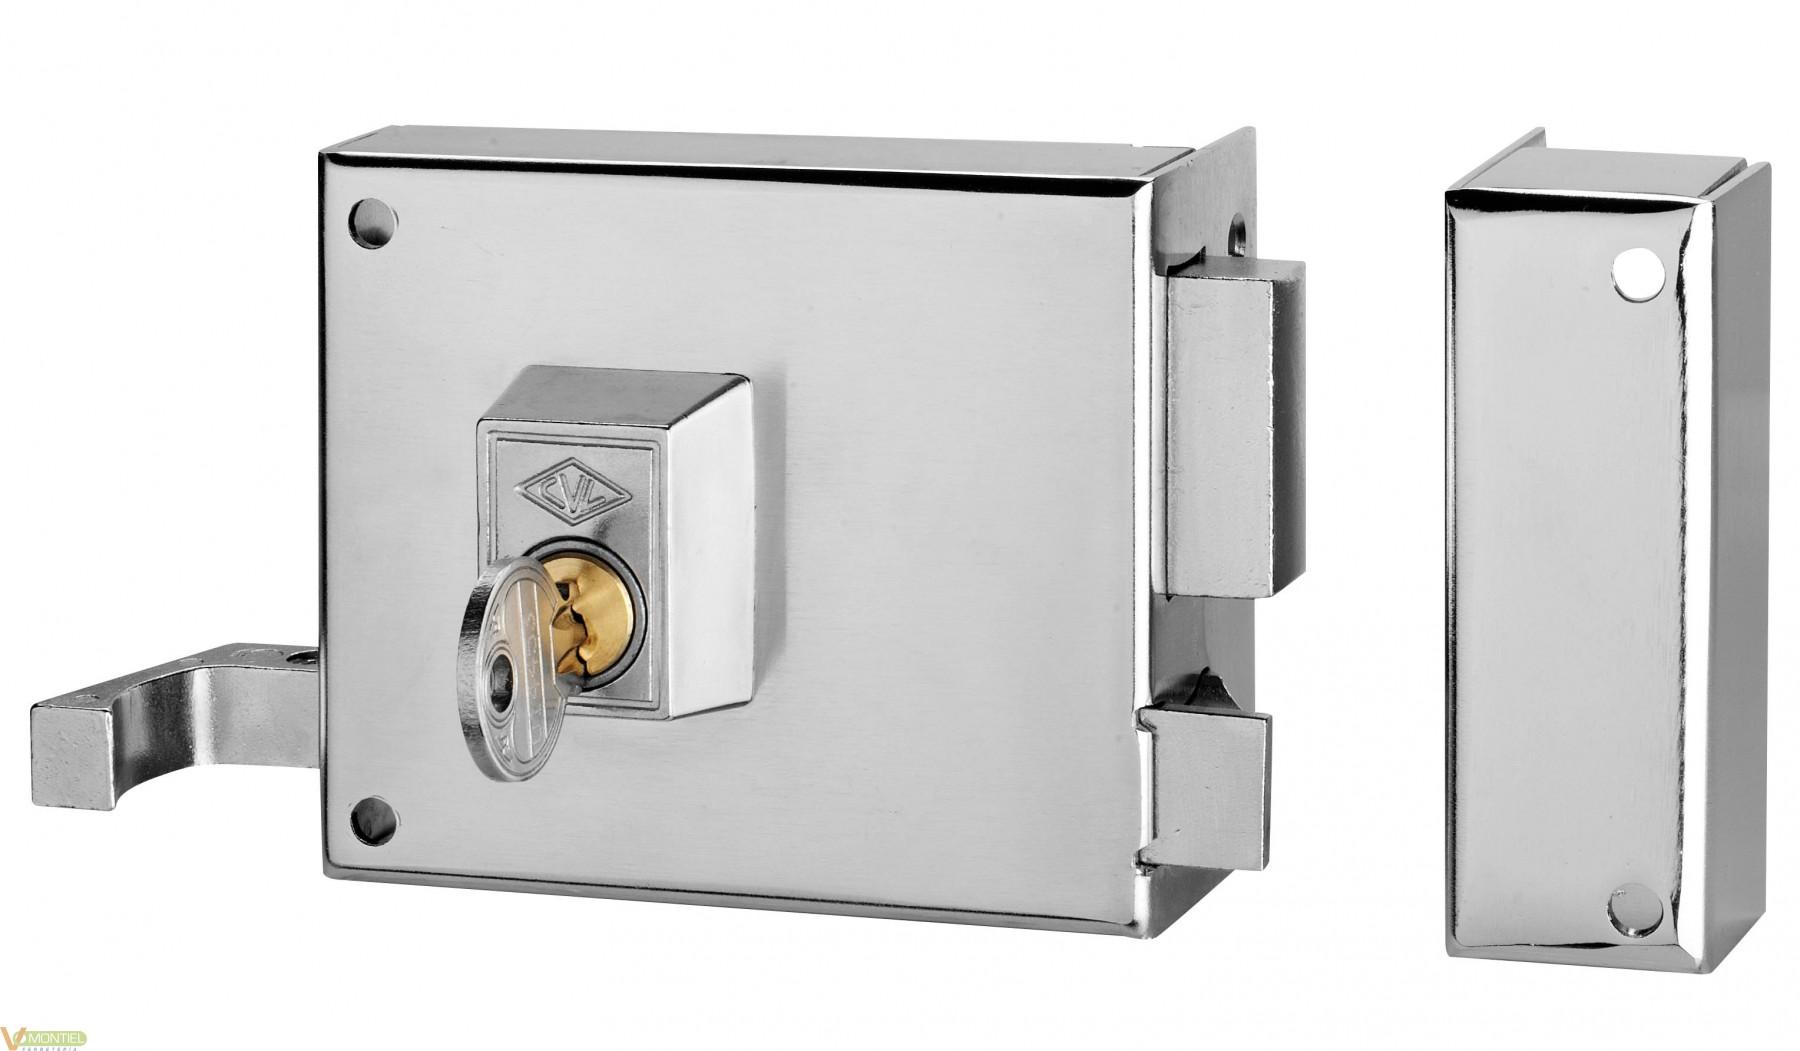 Cerradura sobr. 80x60mm 125a08-0